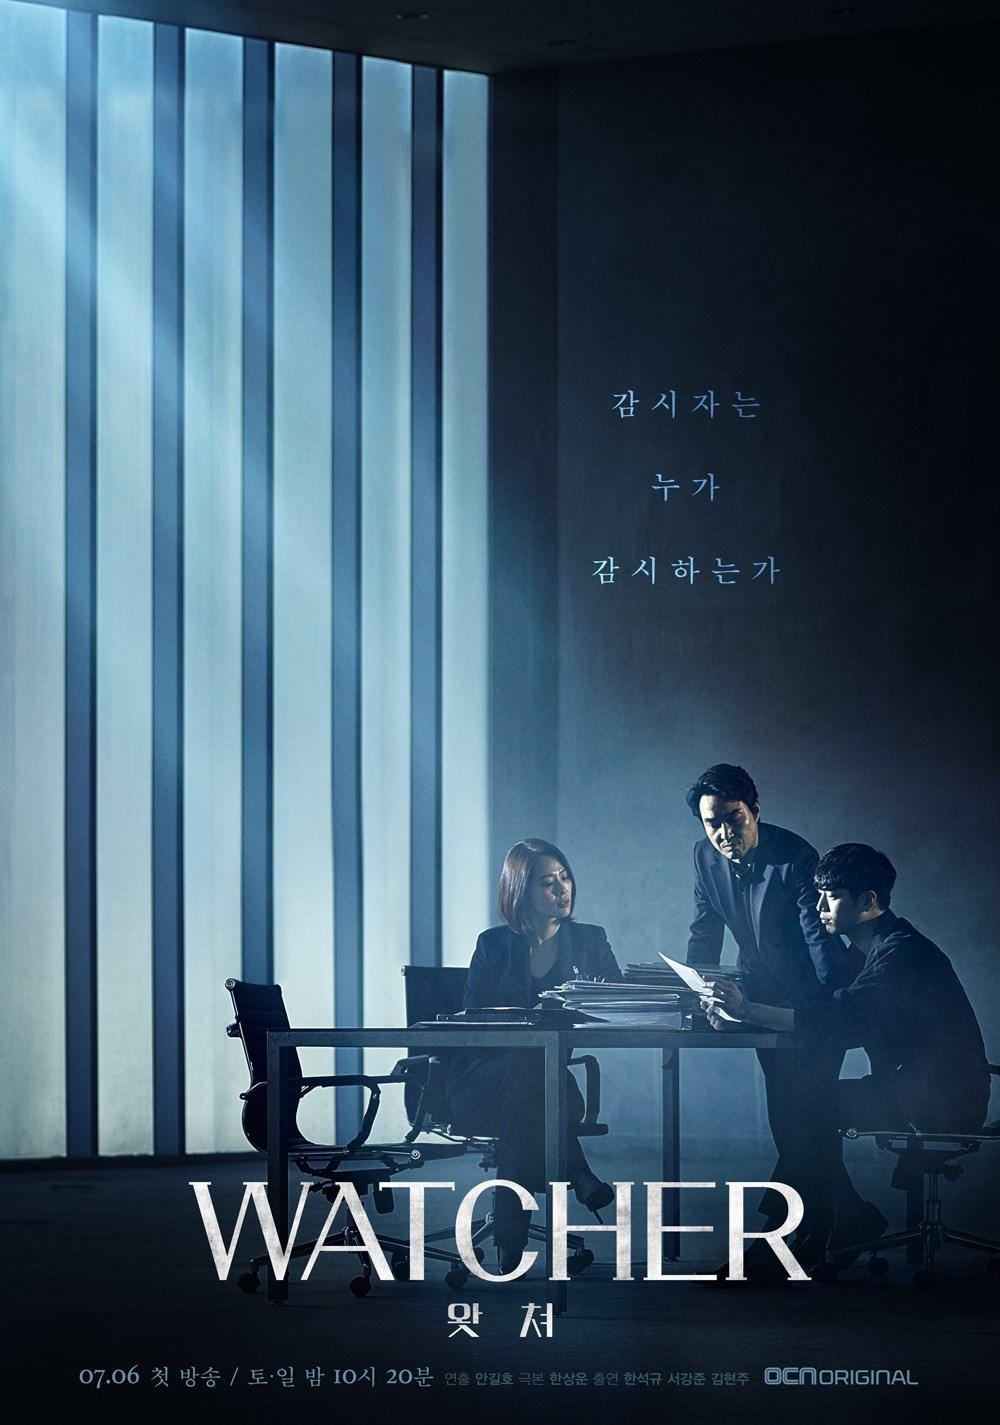 WATCHER (Watchyeo / 왓쳐) (2019)